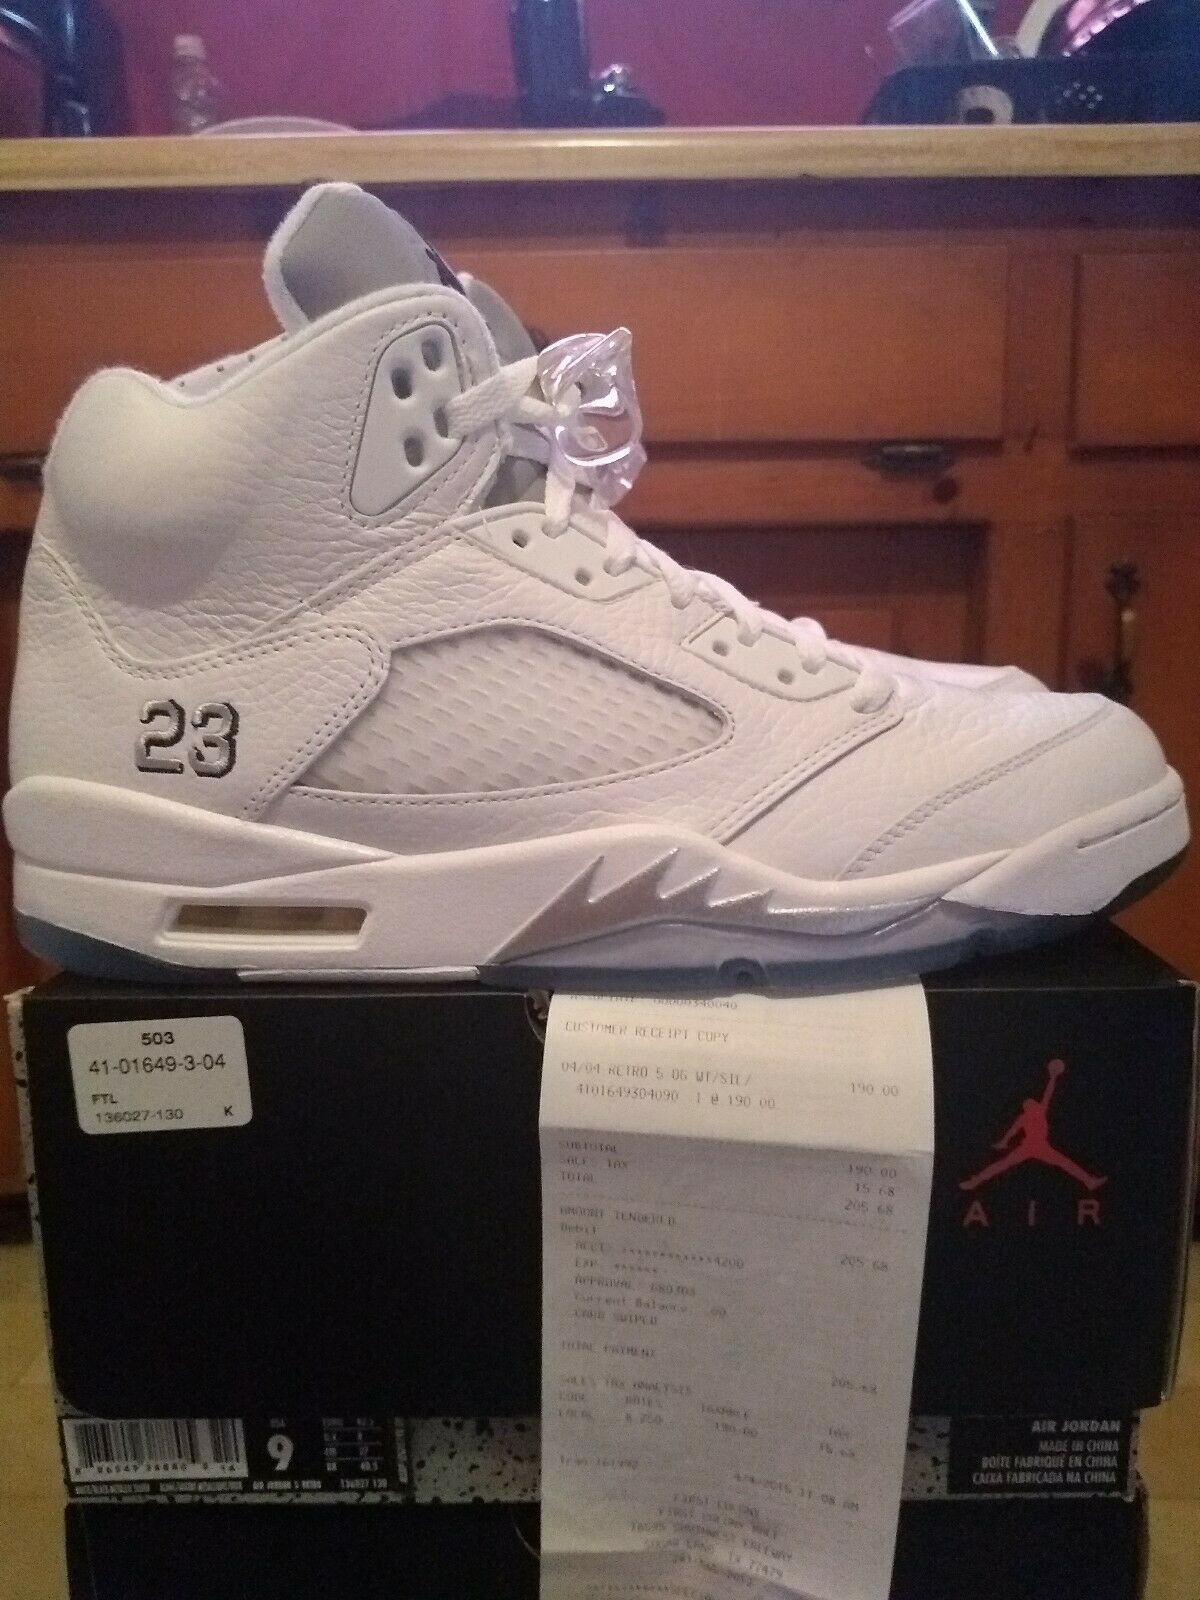 Jordan 5 White Mettallic Silver Size 9 DS